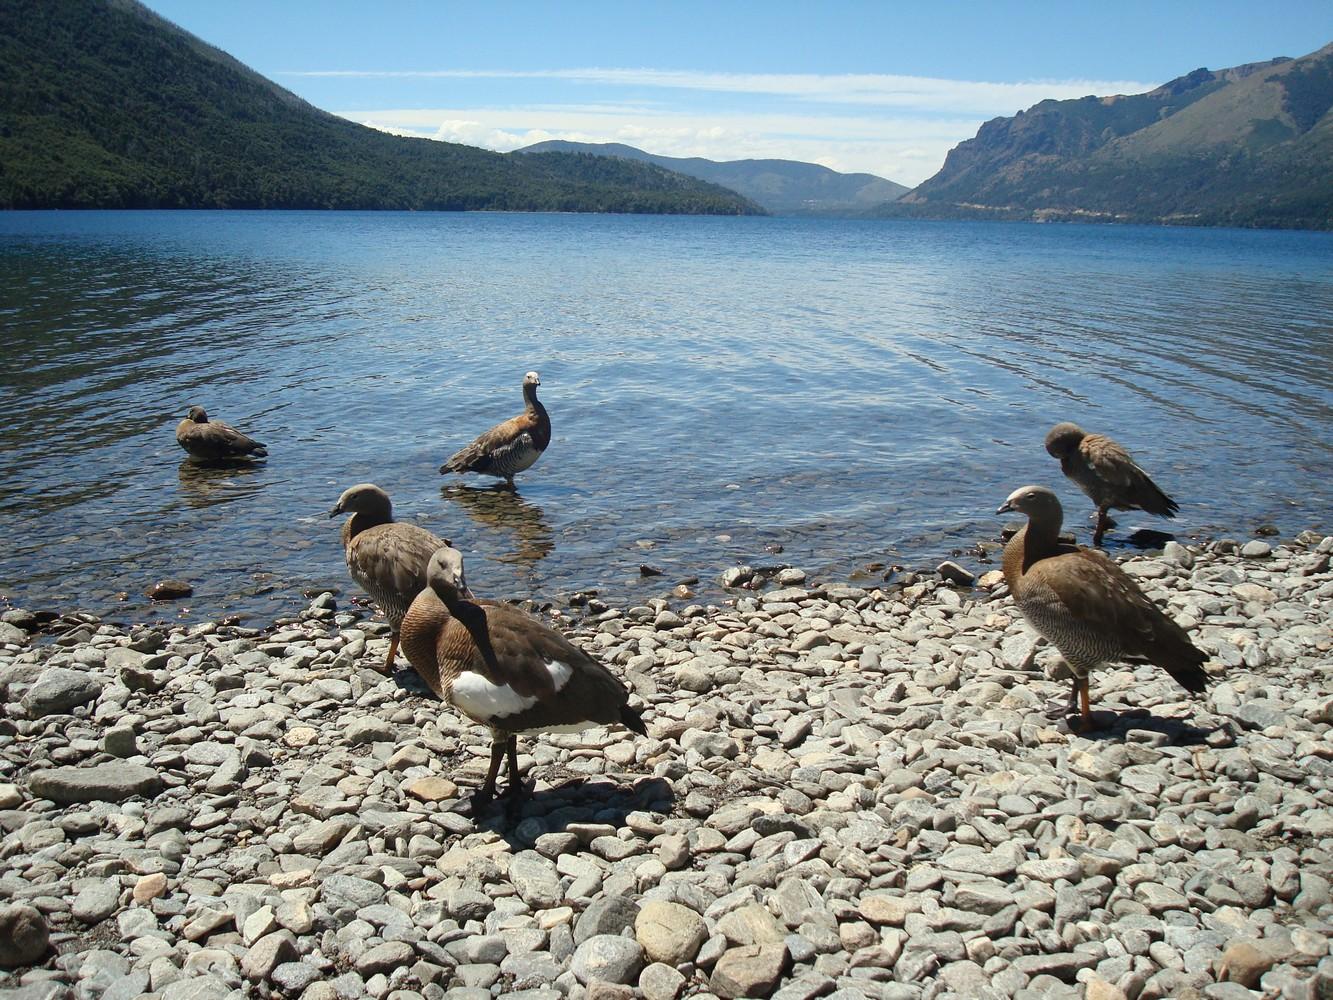 Cauquenes - Lago Gutierrez - Bariloche